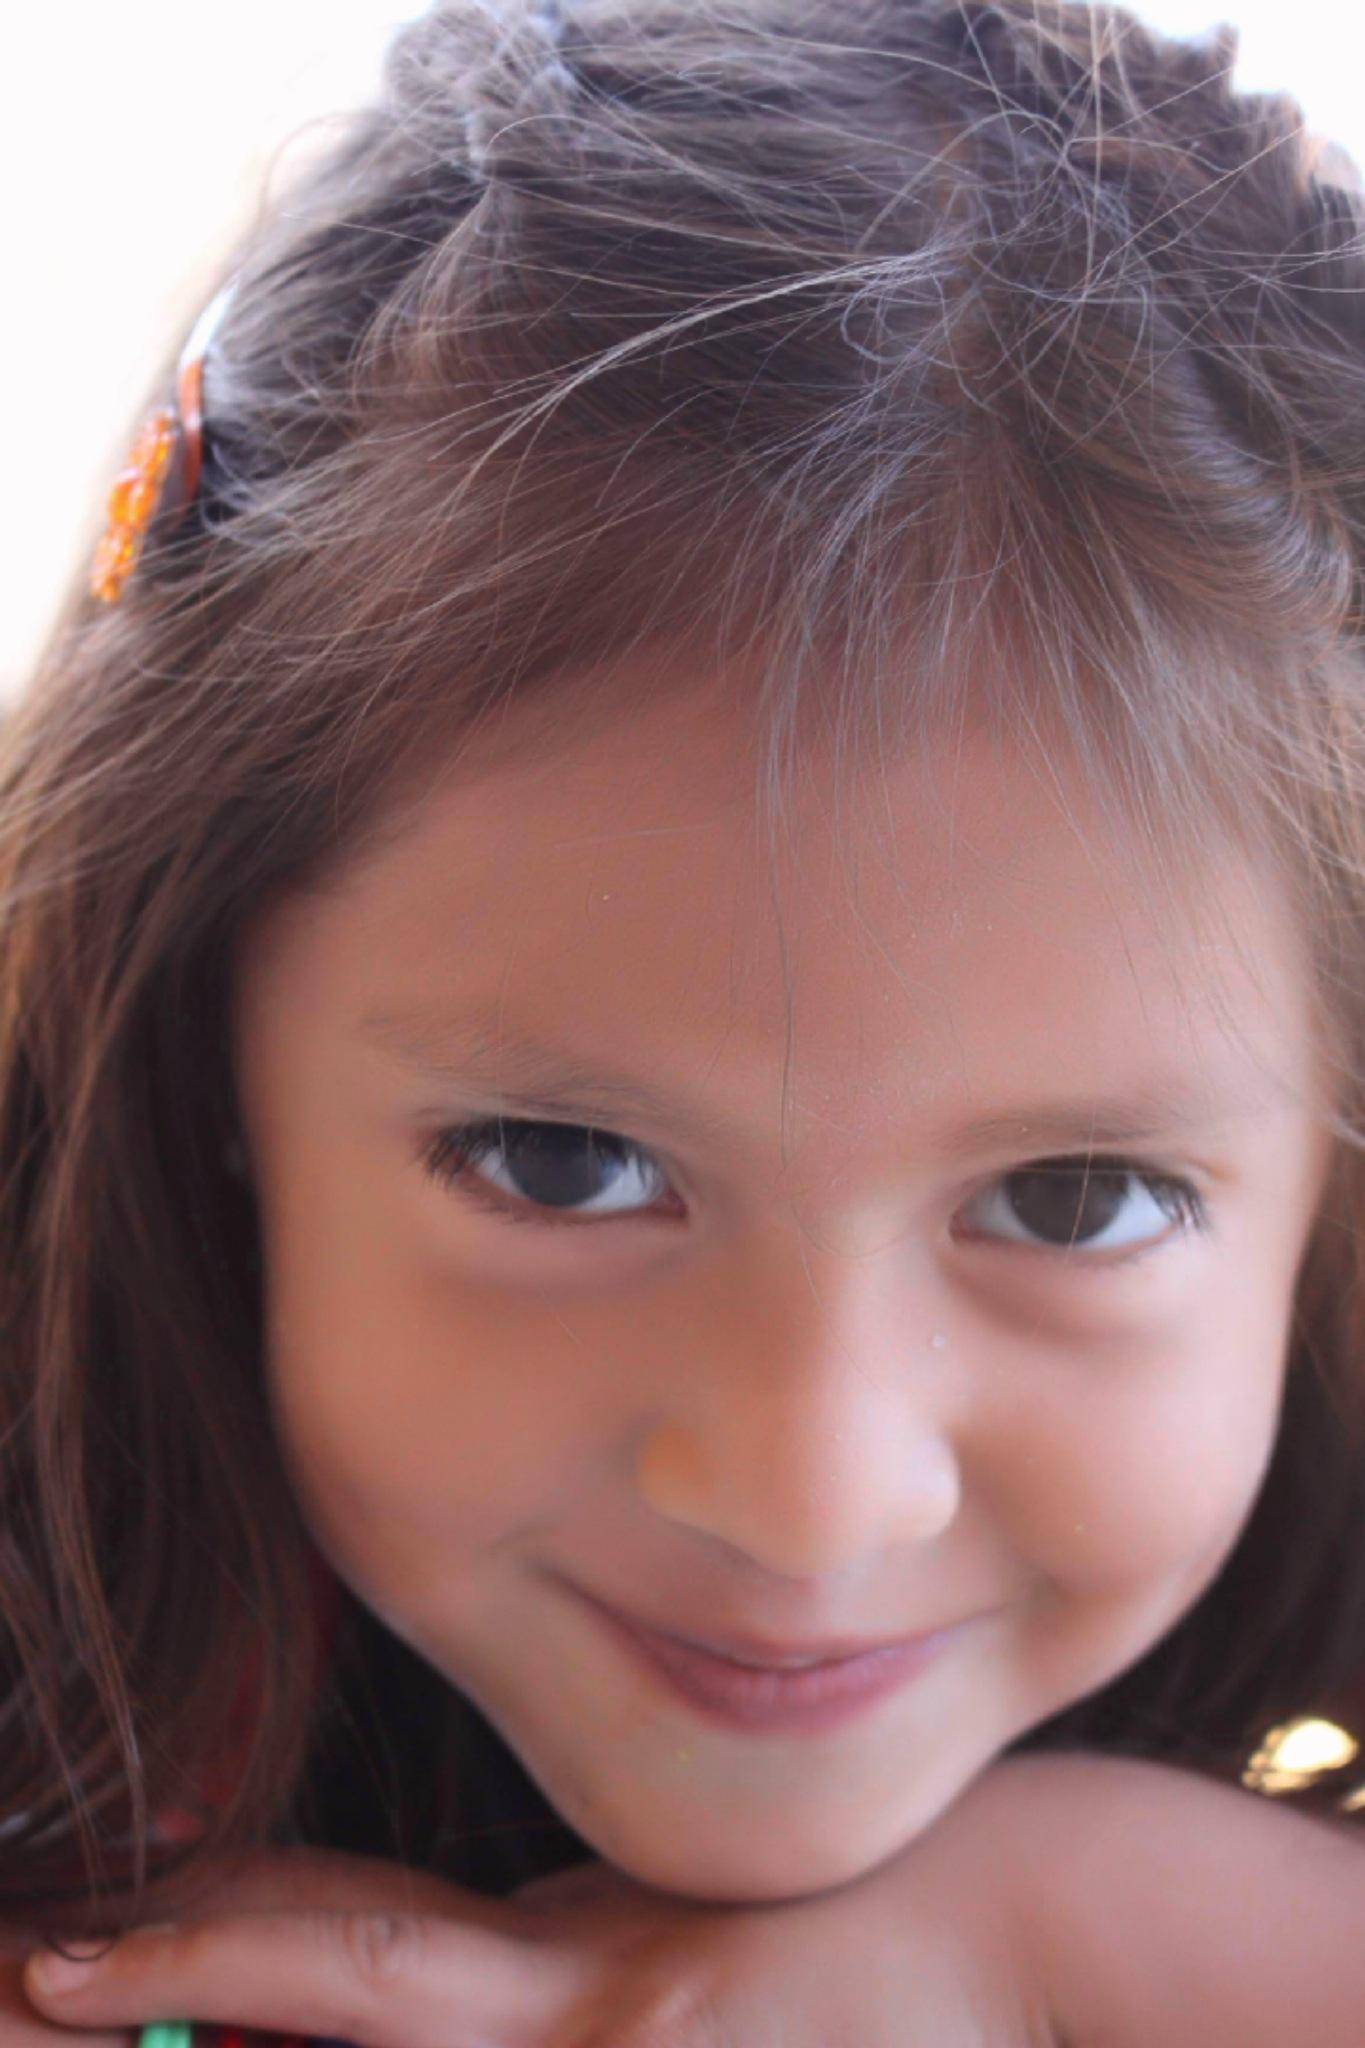 Beautiful Little One by derek.oliver3